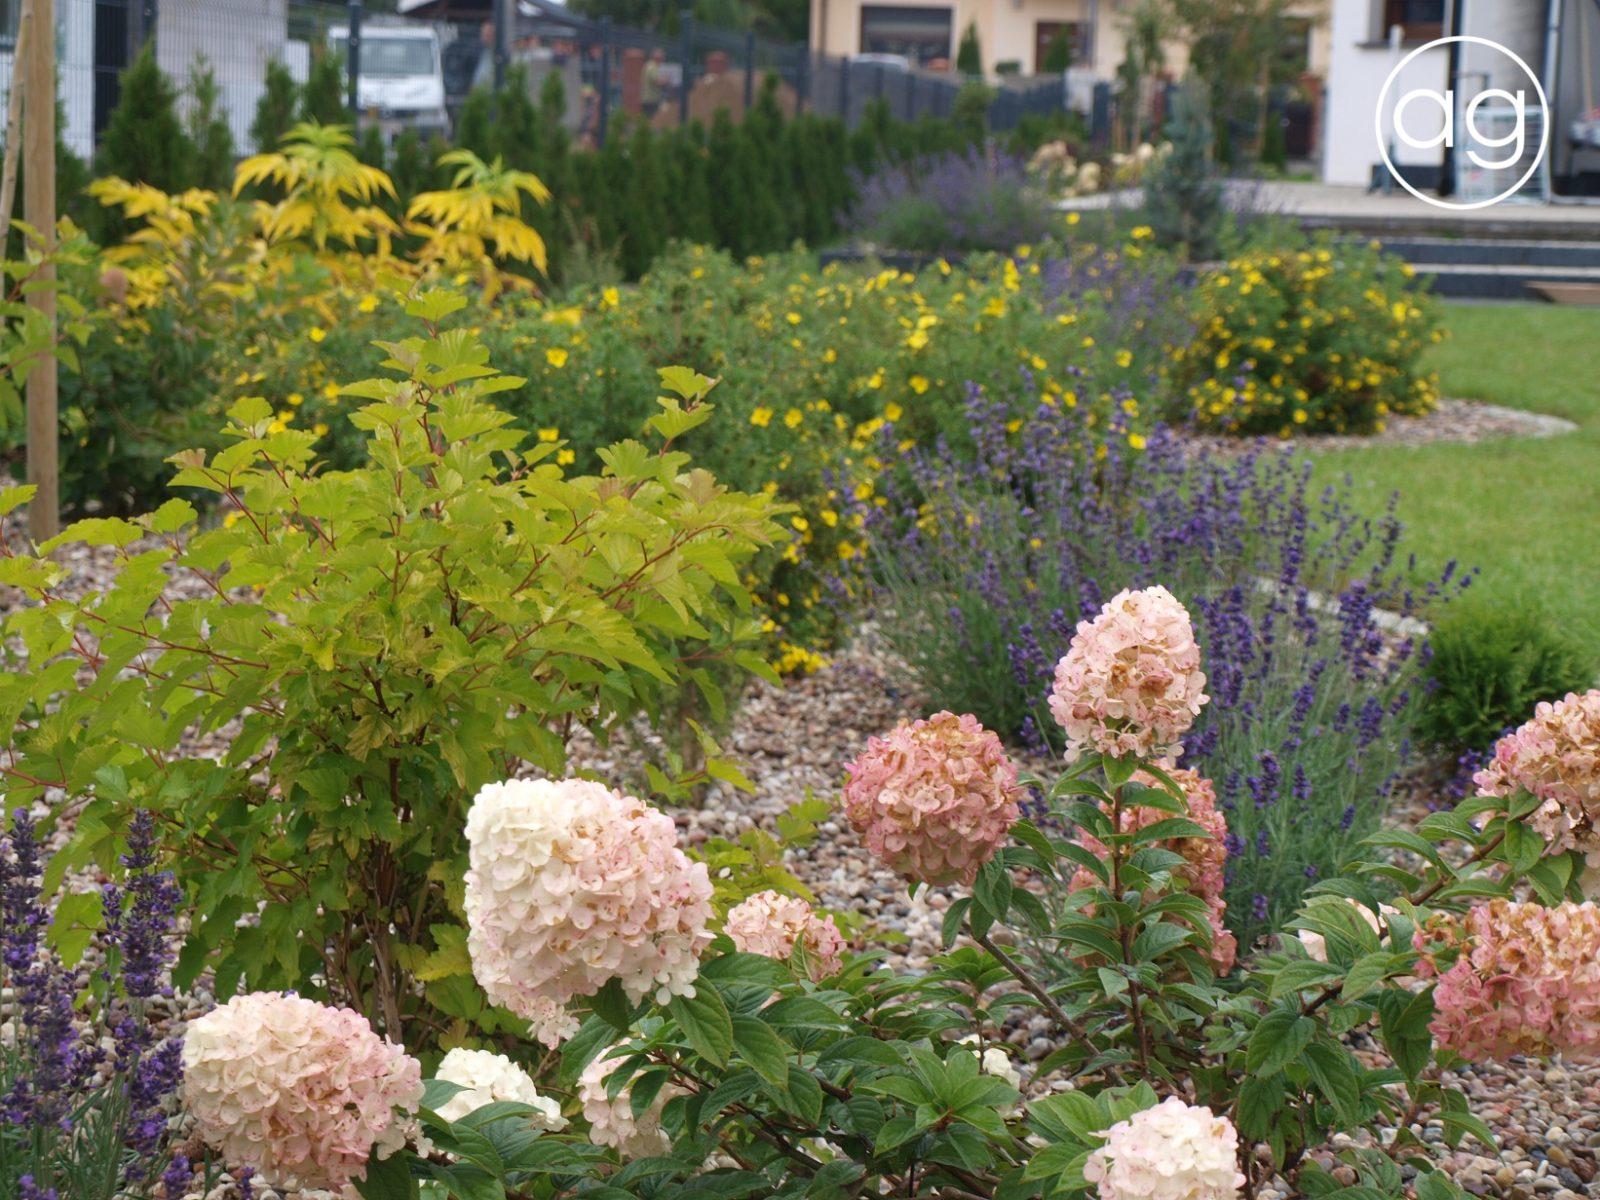 projektowanie ogrodów, projekt, ogrody, architektura krajobrazu, architektura, krajobraz, blog, przyroda, rośliny, natura, agnieszka gertner, architecture, gardens, landscape, design